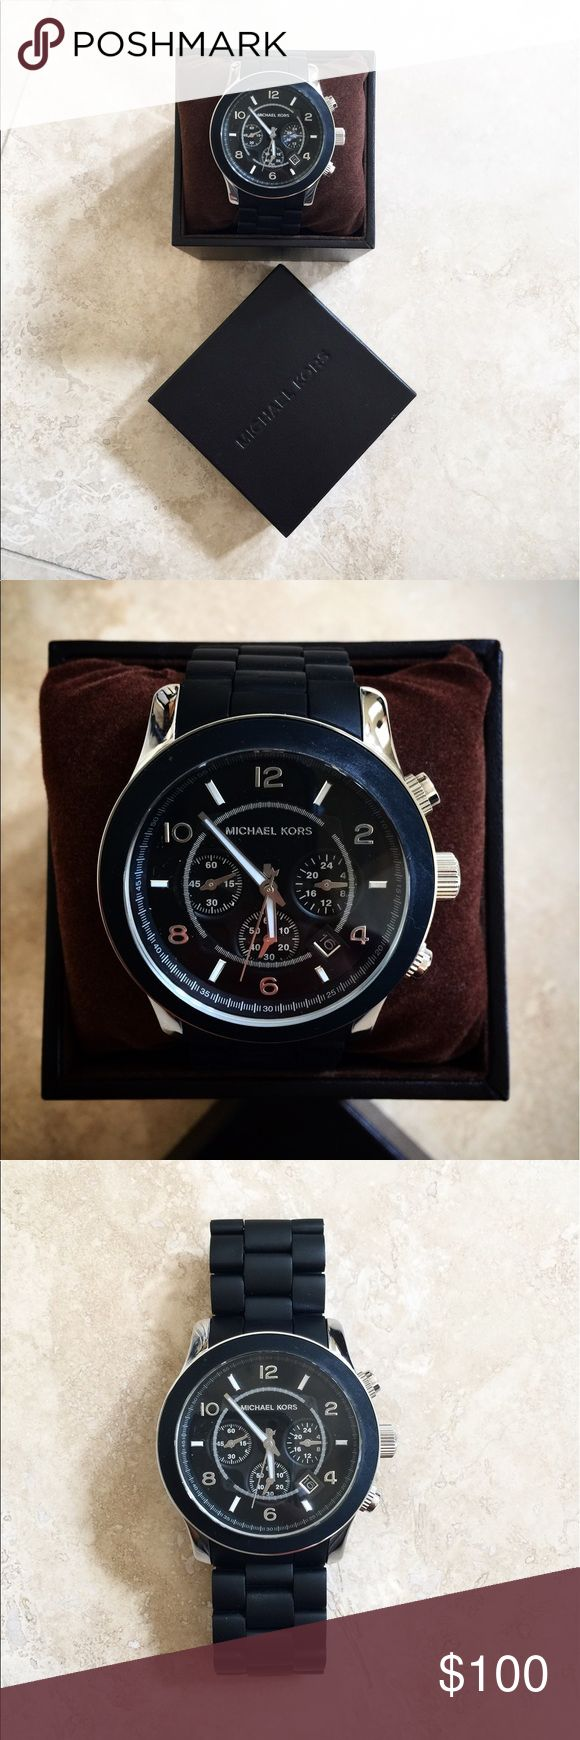 Men's Michael Kors Runway Watch Men's Michael Kors Runway Watch in all black. My husband never ending up wearing it, it's brand new. Michael Kors Accessories Watches